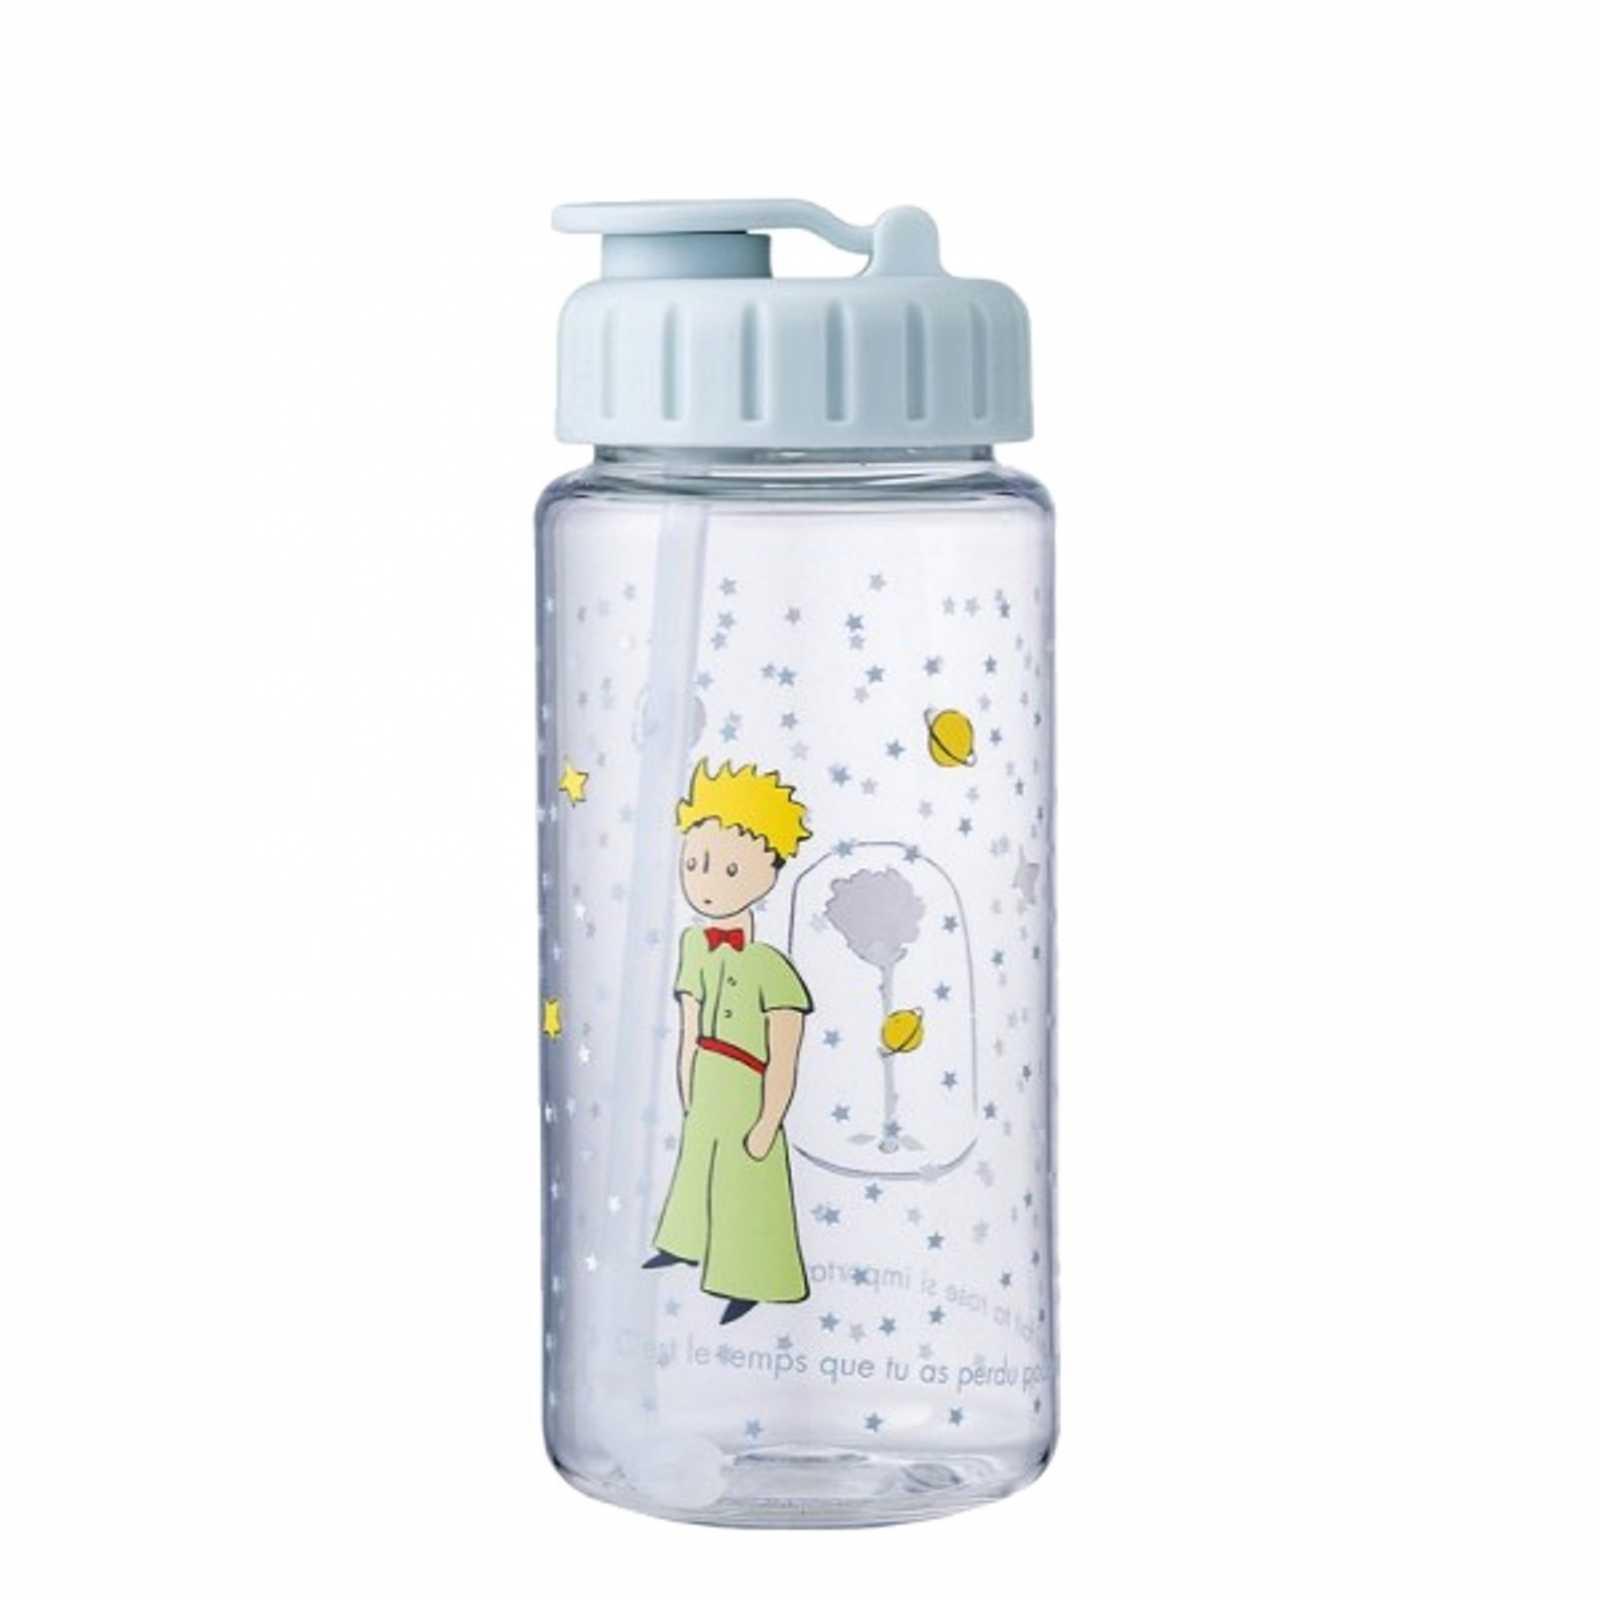 Онлайн каталог PROMENU: Бутылка детская Maison Petit Jour LE PETIT PRINCE, объем 0,35 л, прозрачная с рисунком  PP900K